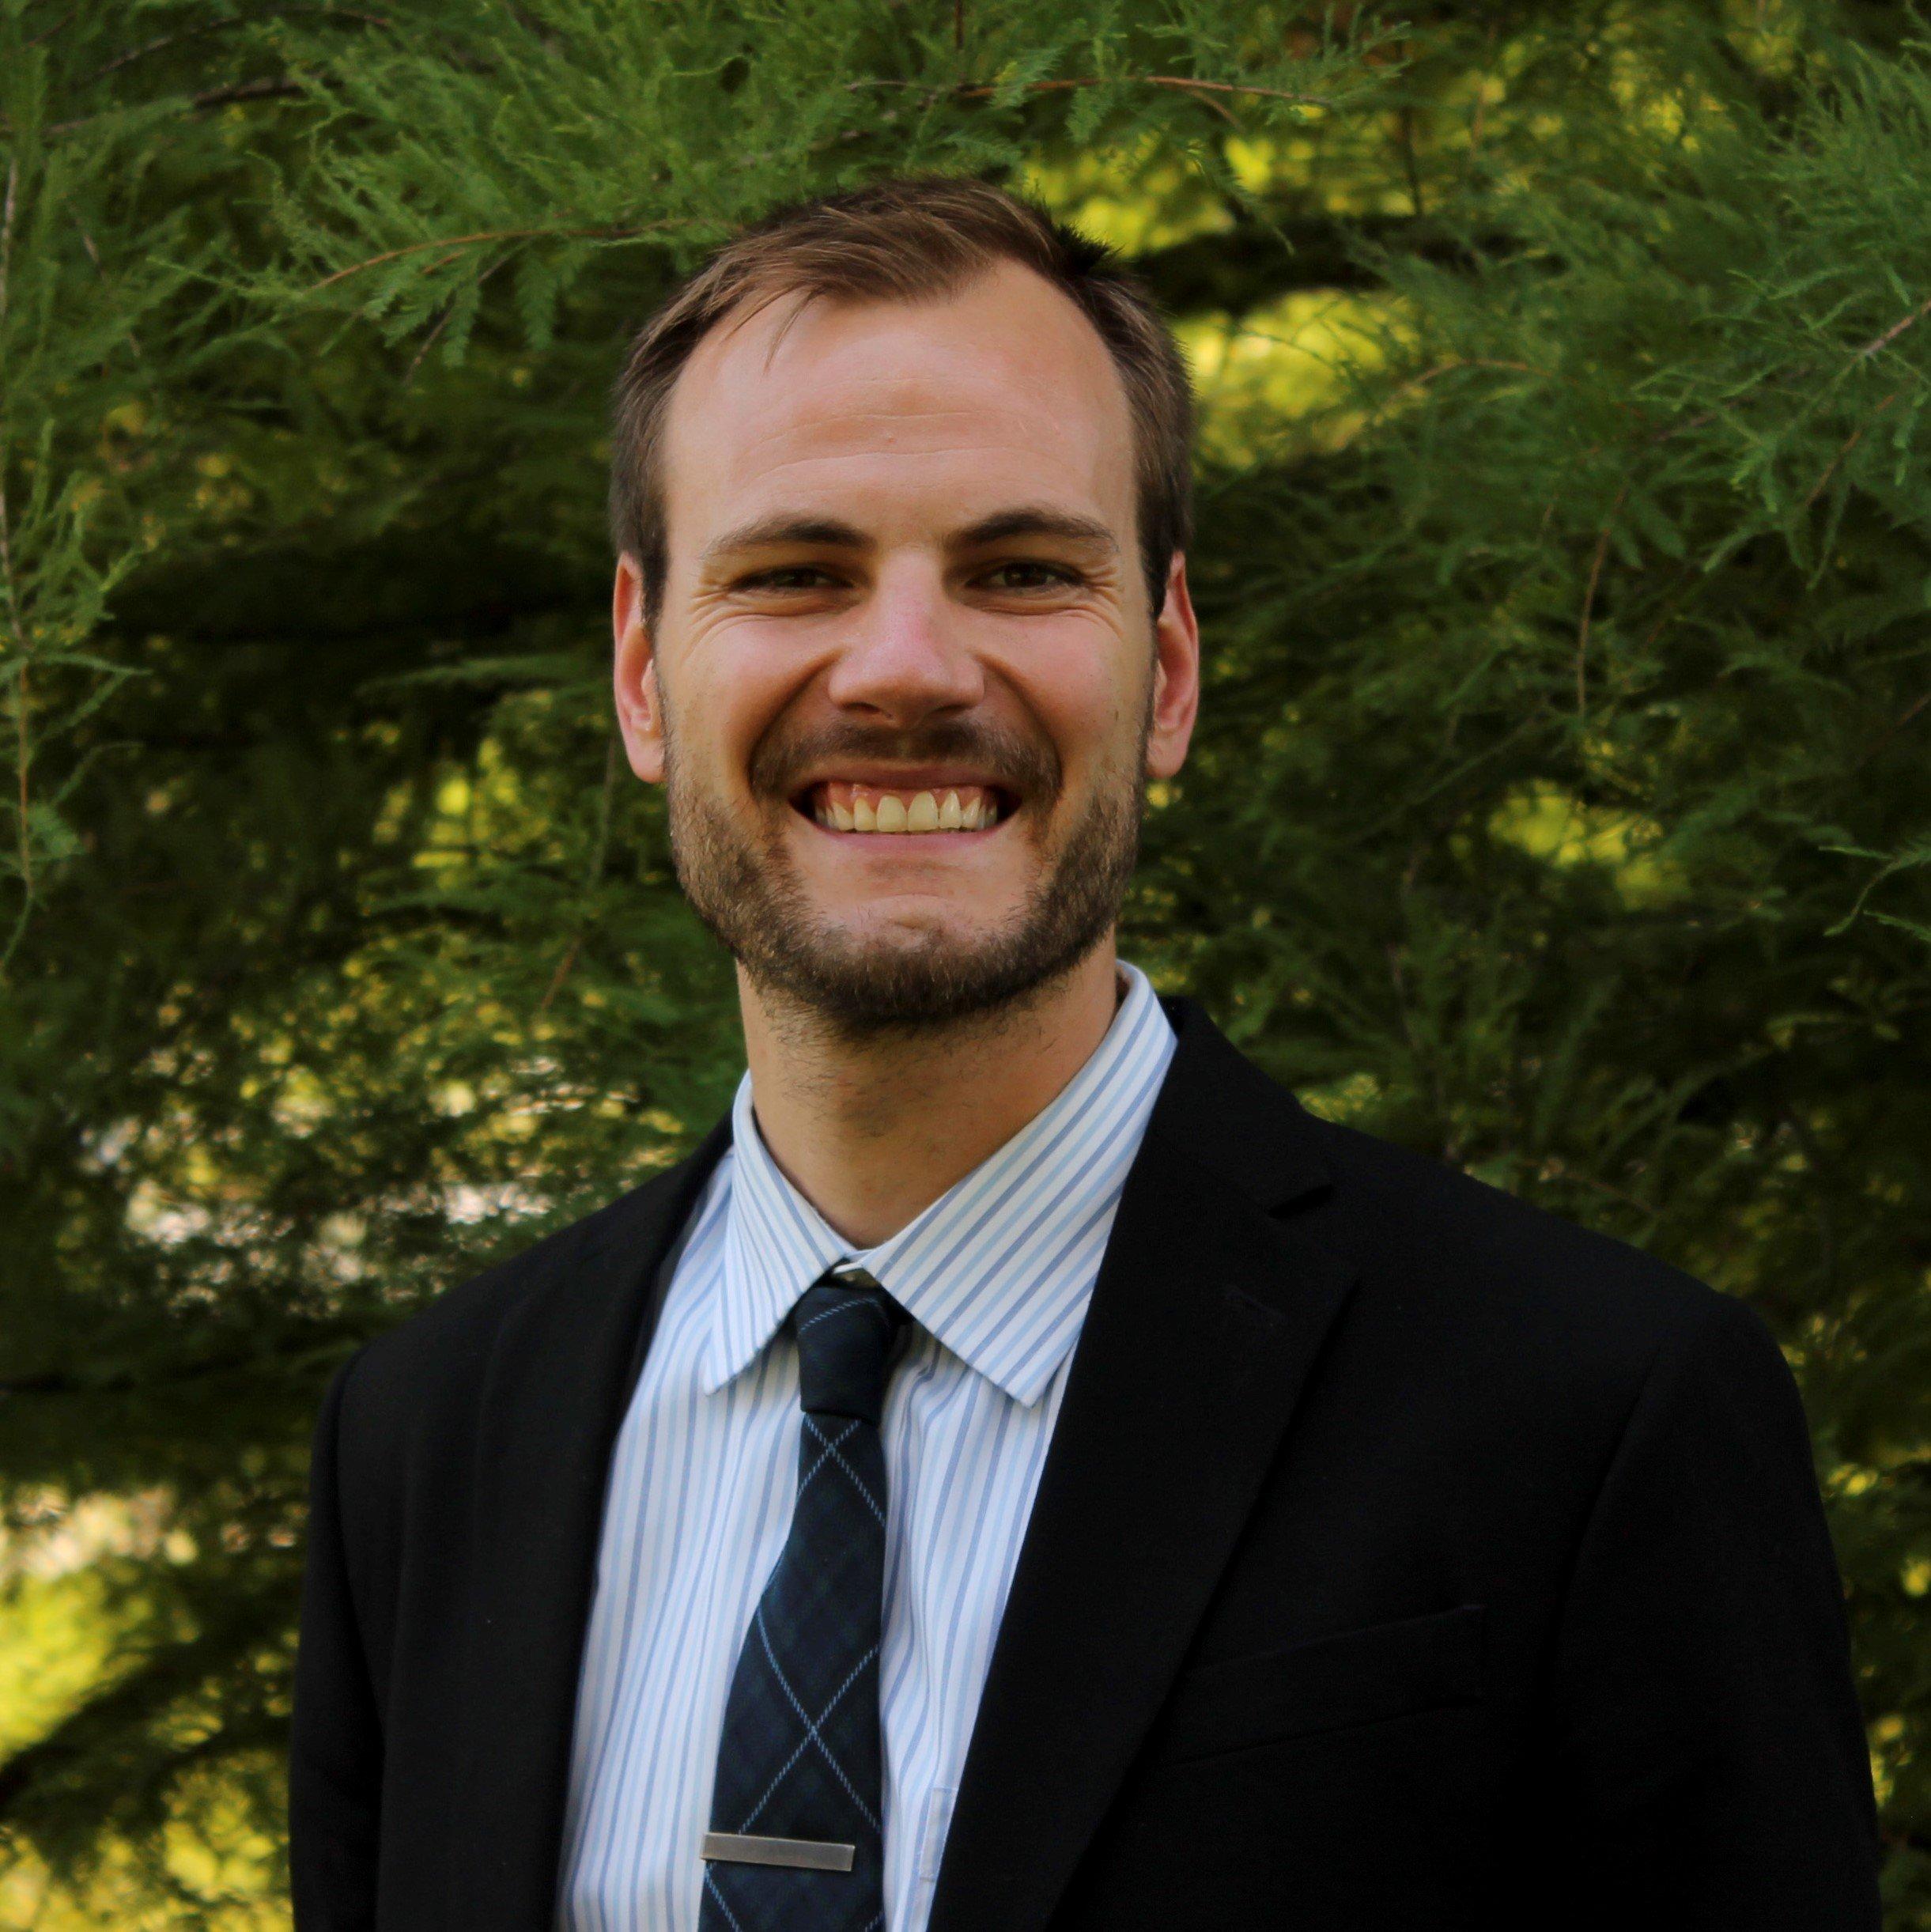 Kolby Atchison, Student Leadership teacher at Clapham School in Wheaton, IL